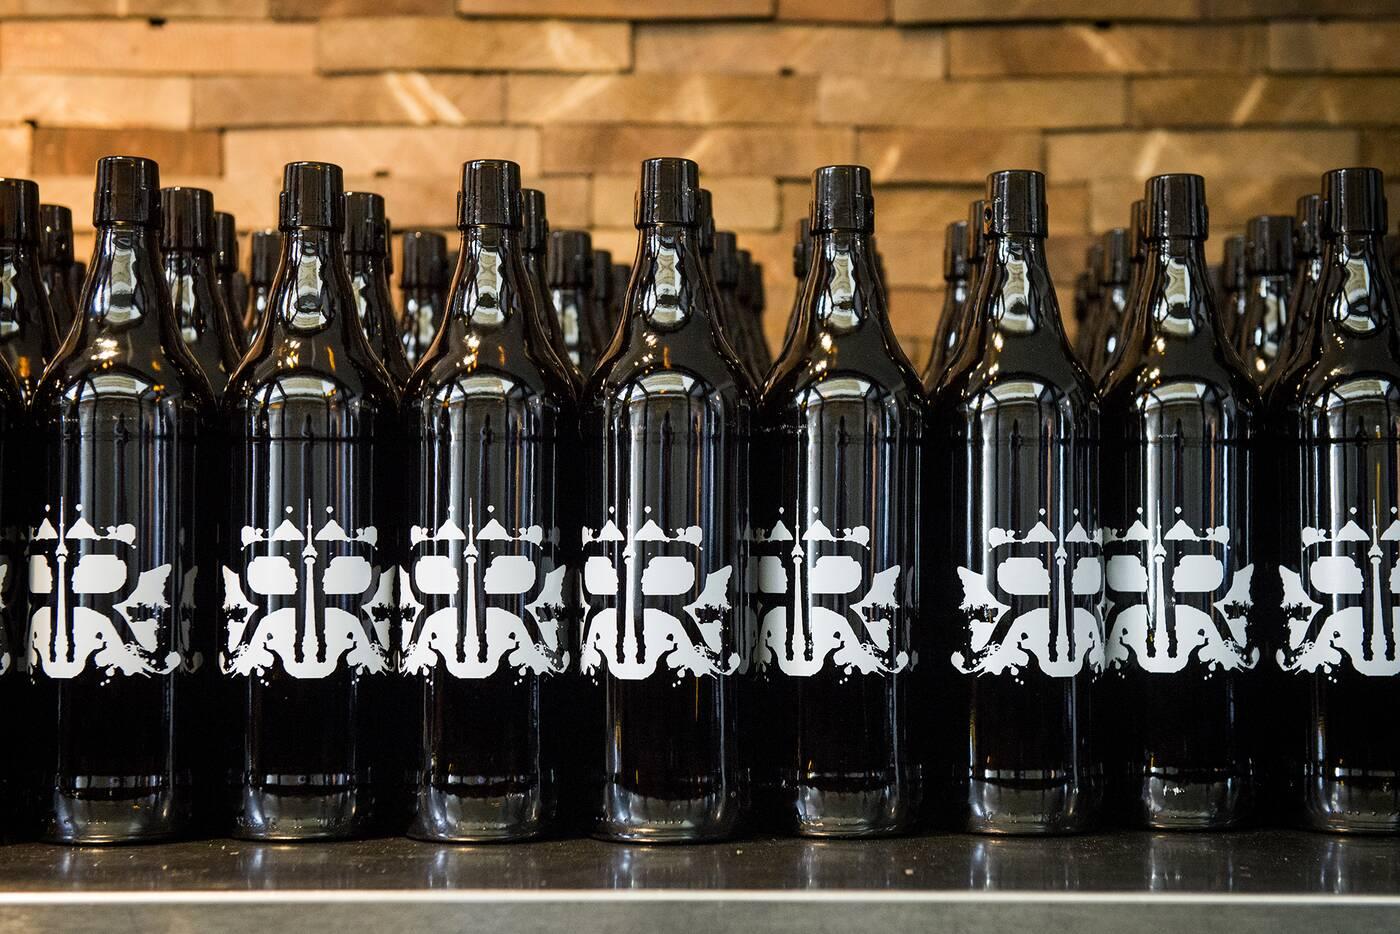 Rorschach Brewery Toronto